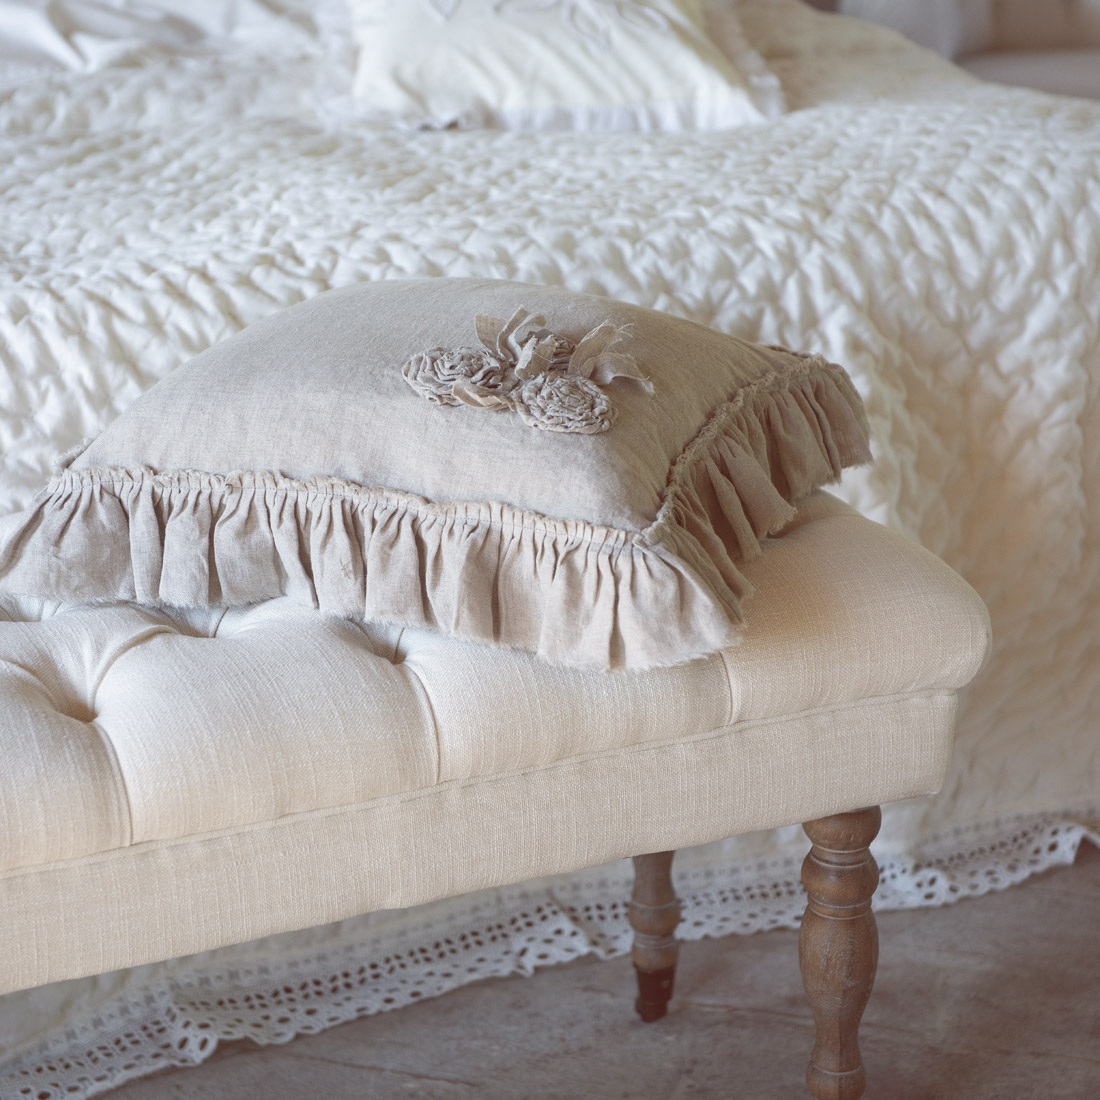 Blanc MariClo' - Cuscino su panca imbottita - Blog